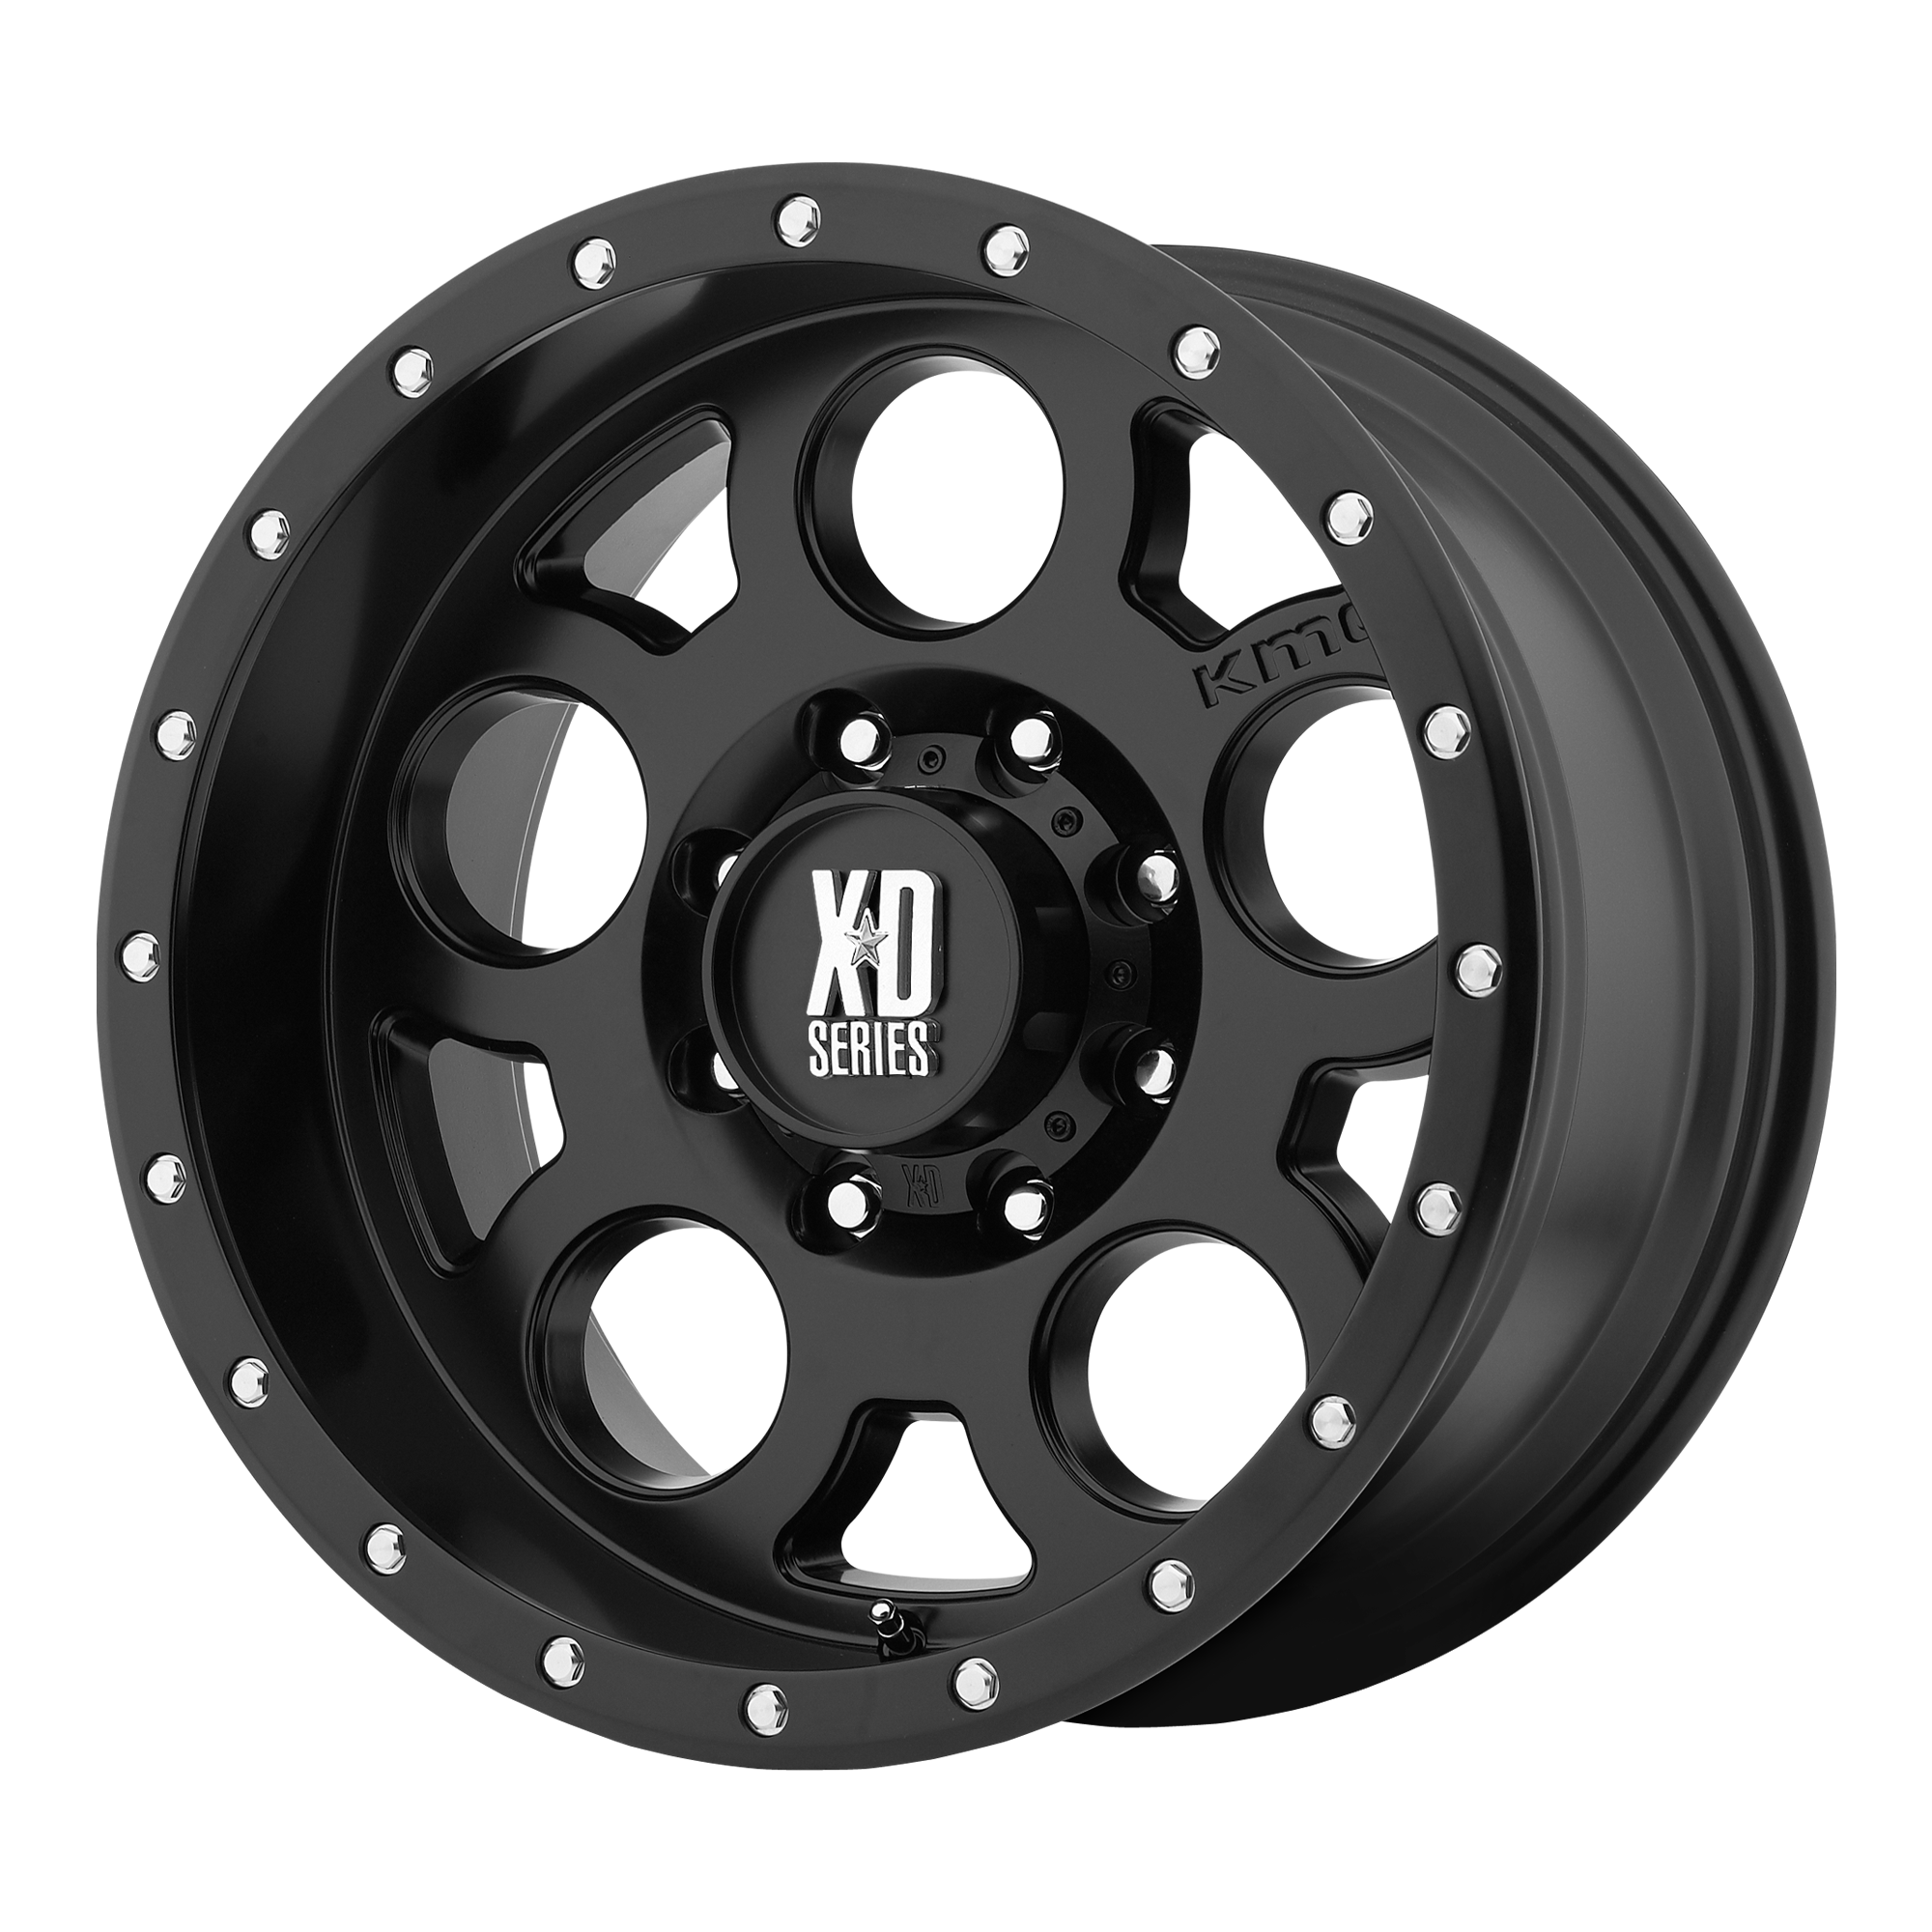 XD SERIES XD126 ENDURO PRO hliníkové disky 9x17 5x127 ET-12 Satin Black With Reinforcing Ring